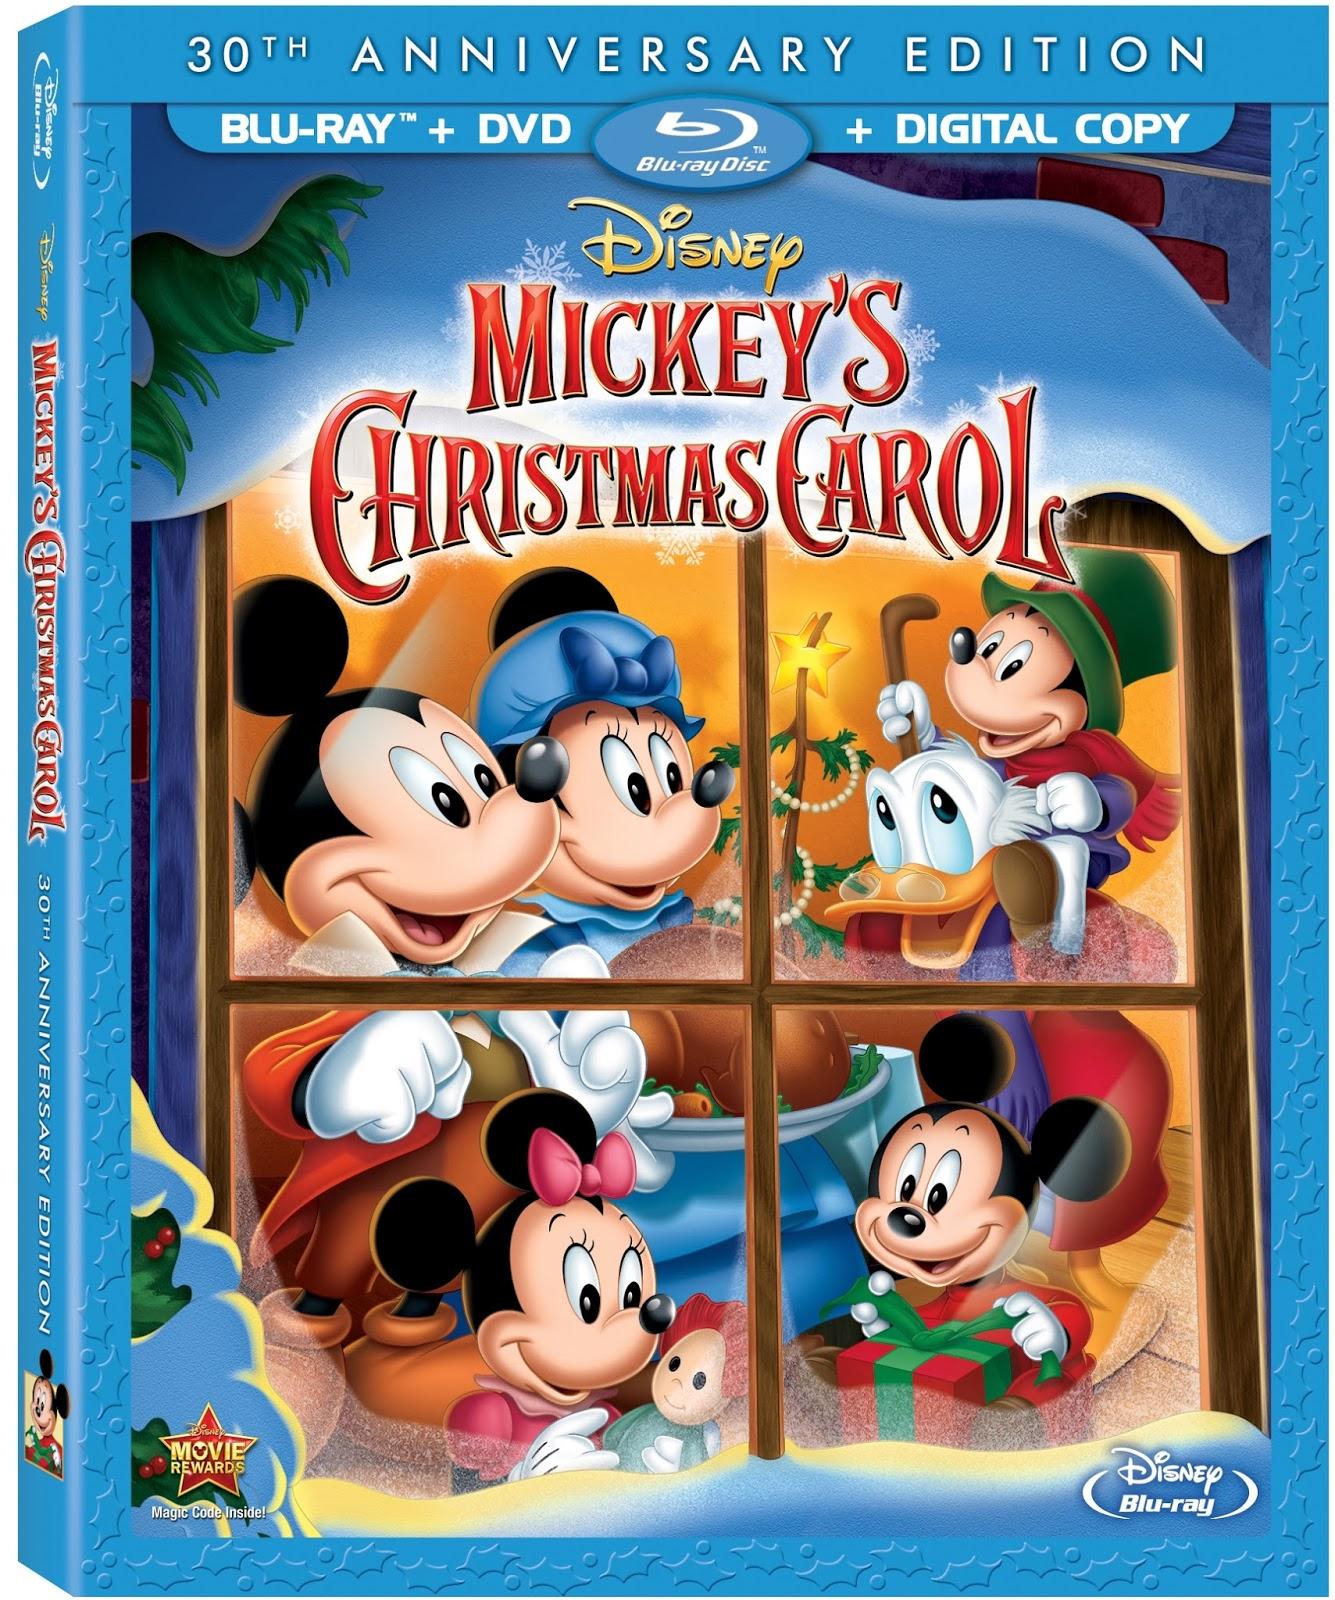 Disney Film Project: November 2013